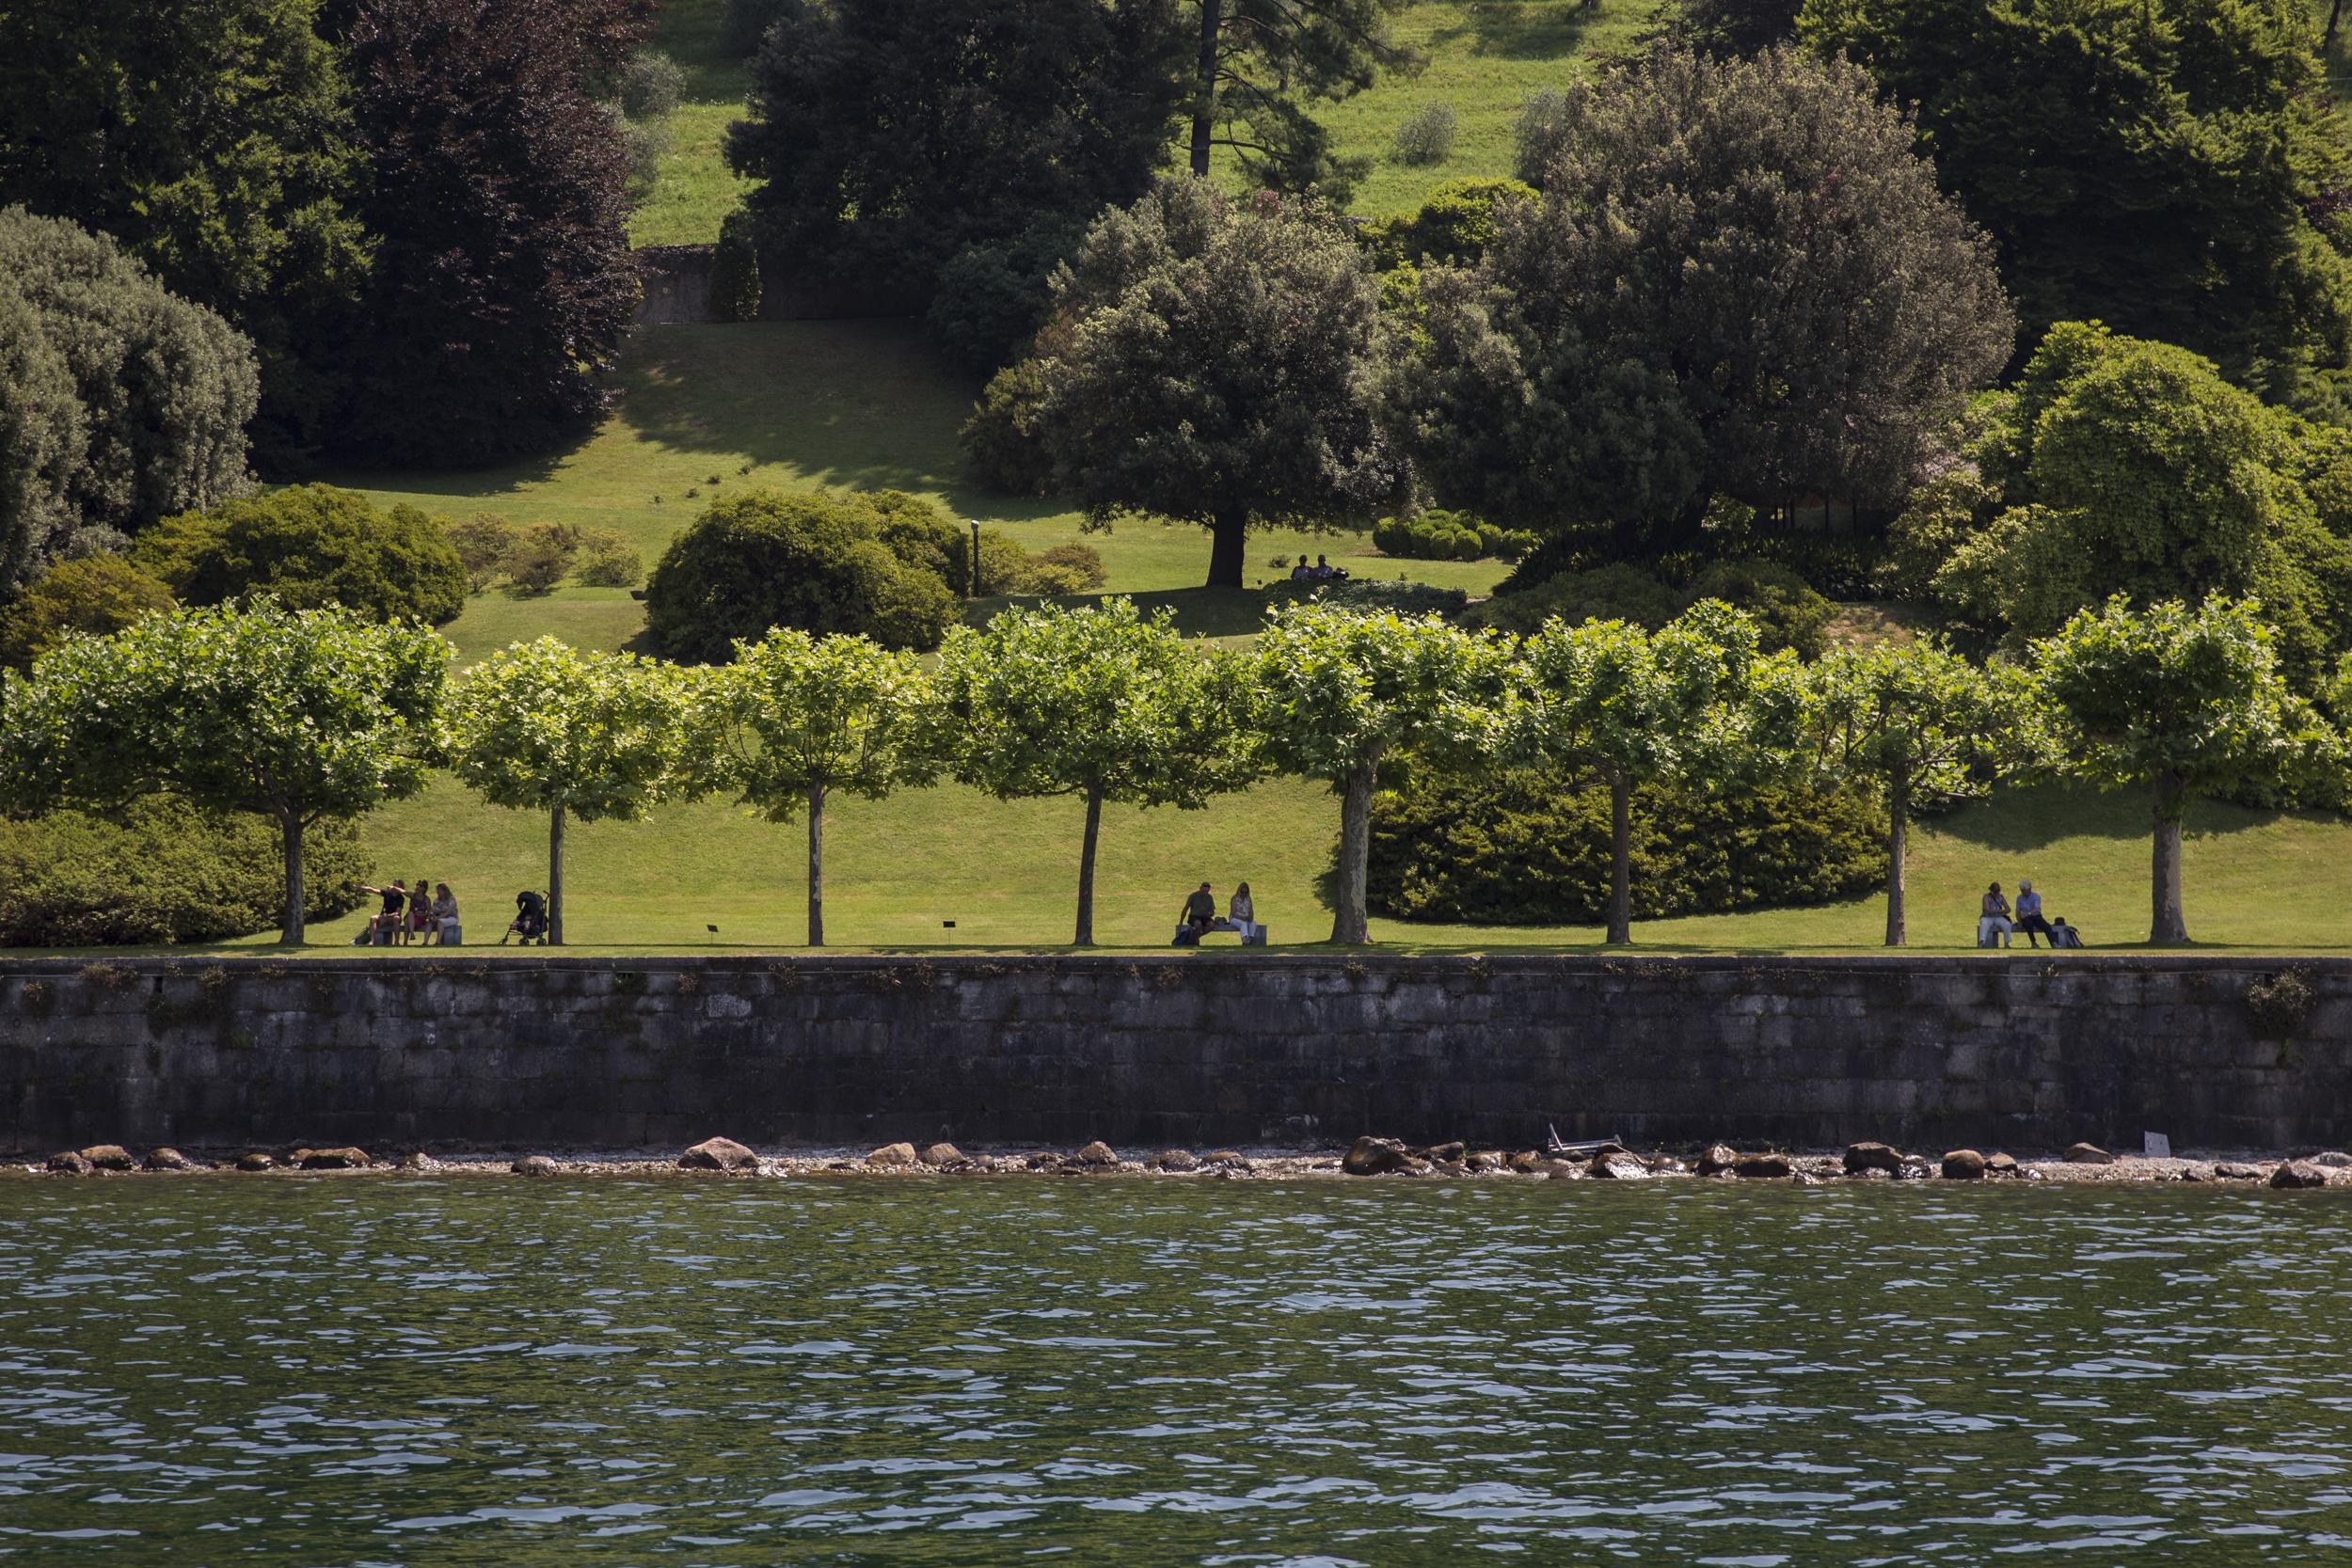 Belaggio, Lake Como, Italy. (June, 2017)